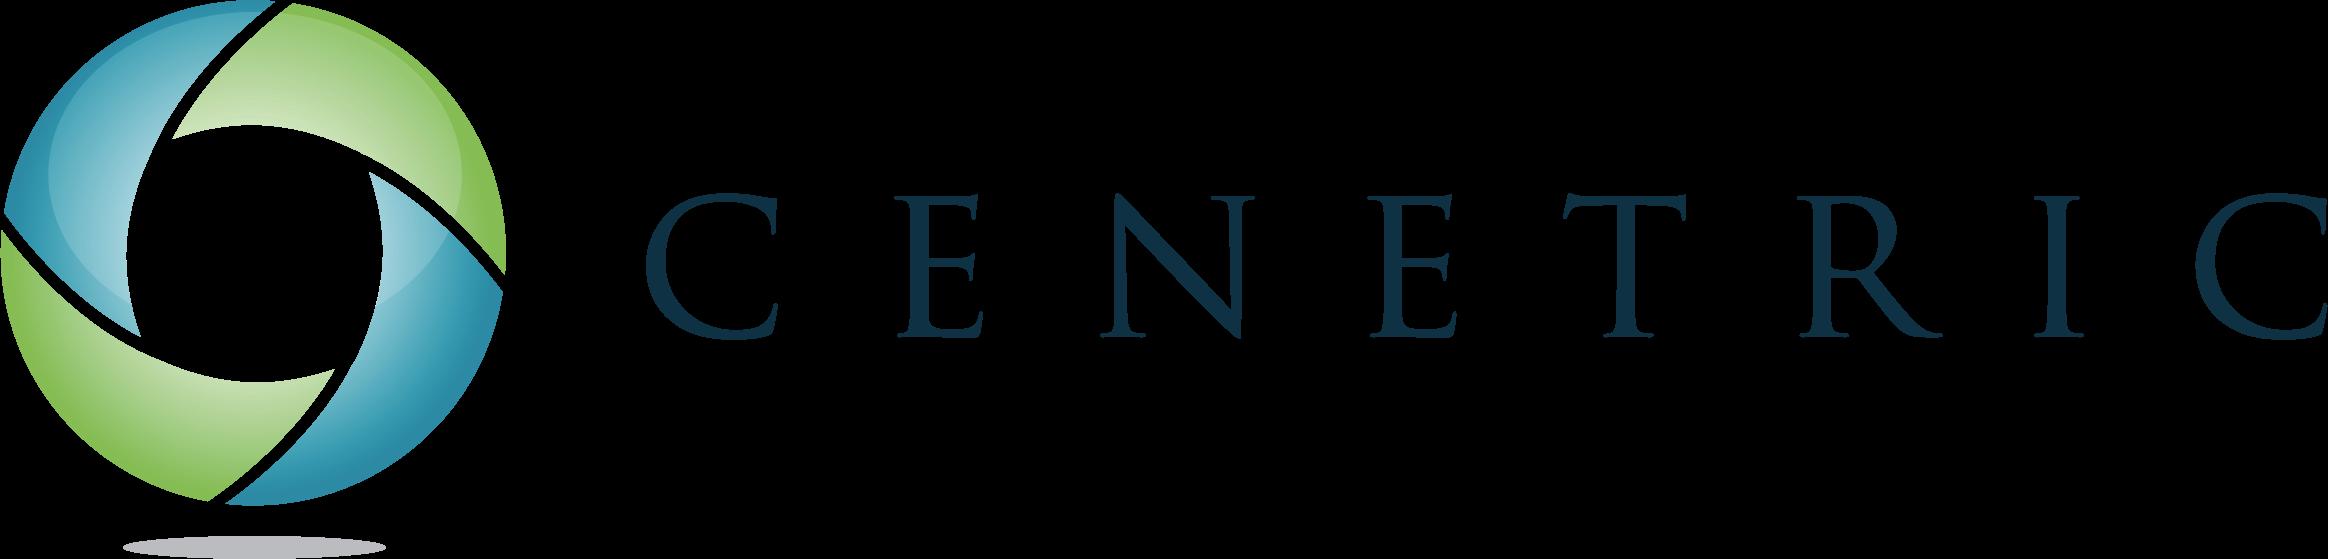 Cenetric Logo.1png